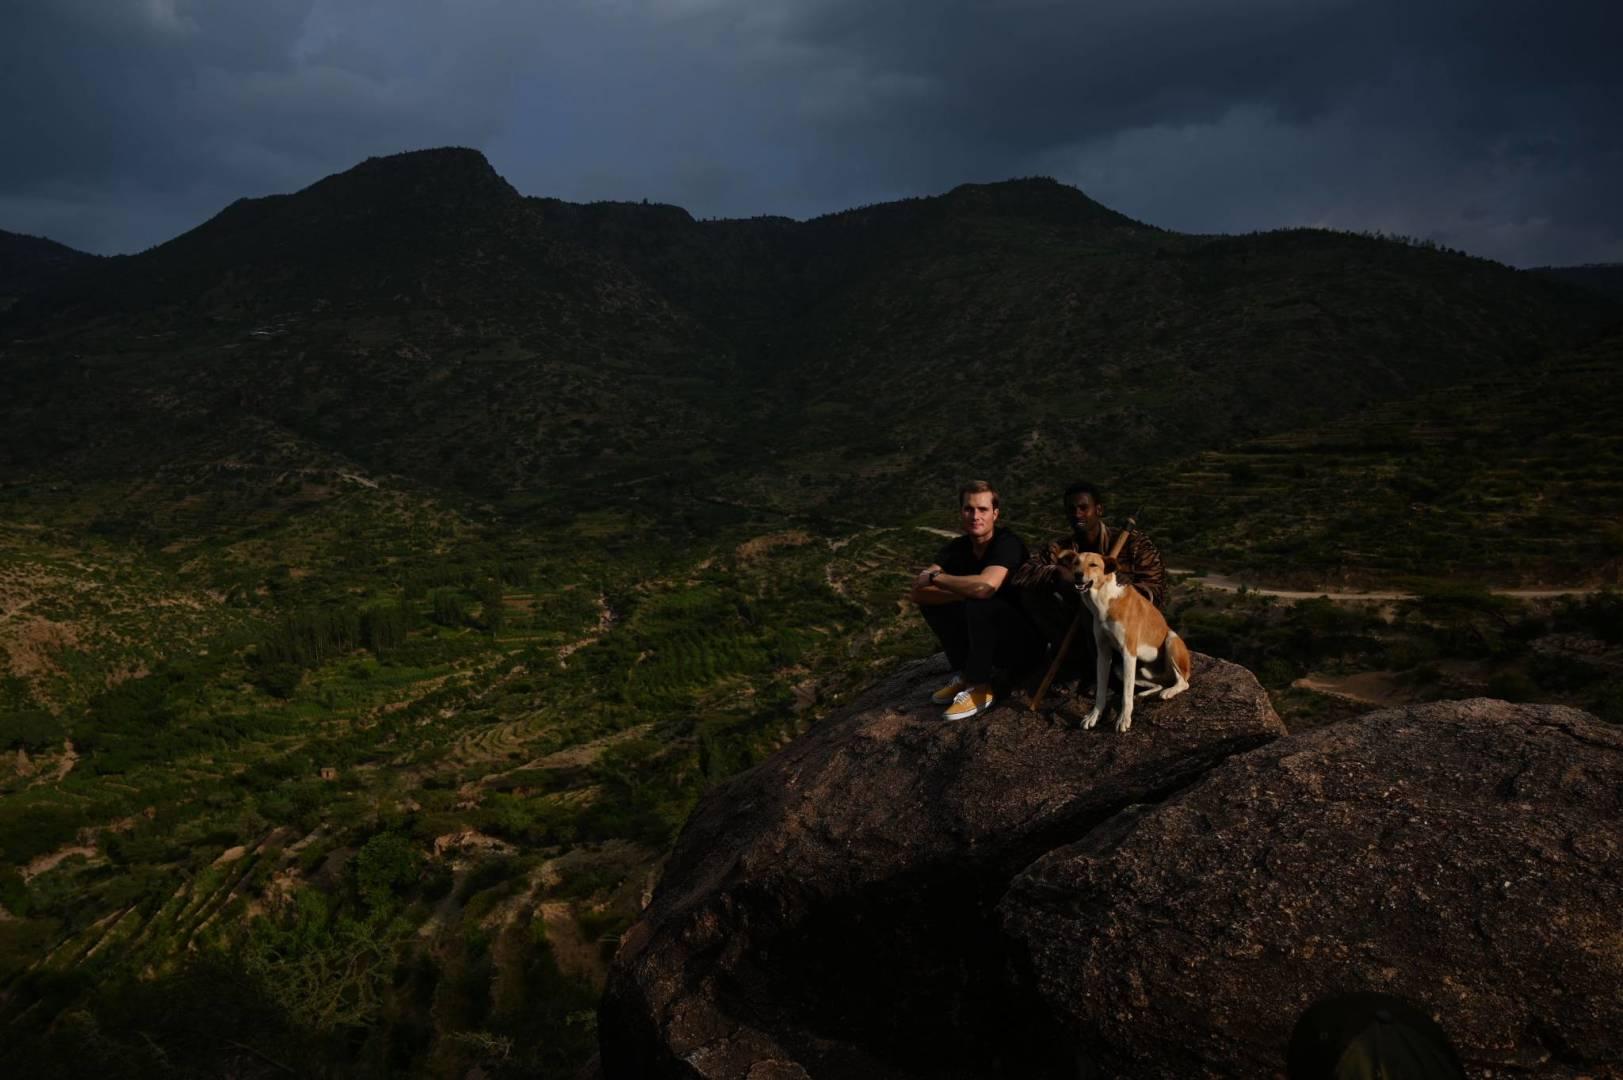 Turisti Curiosi con Bob e Mack Woodruff 9